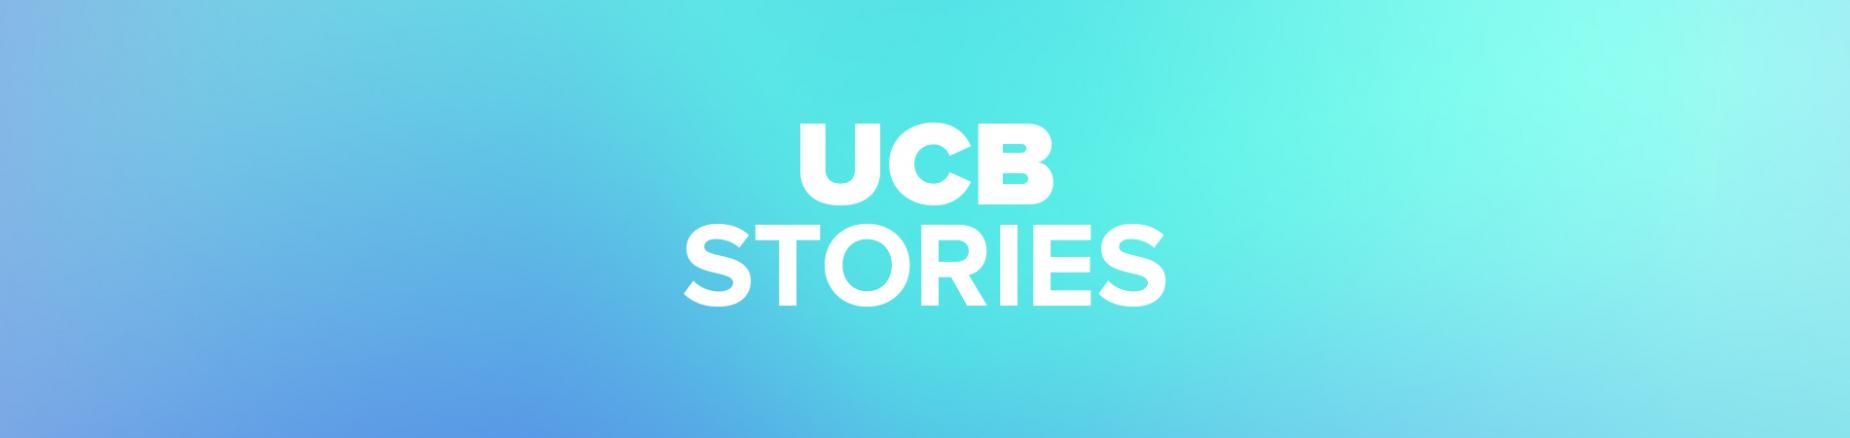 UCB Stories